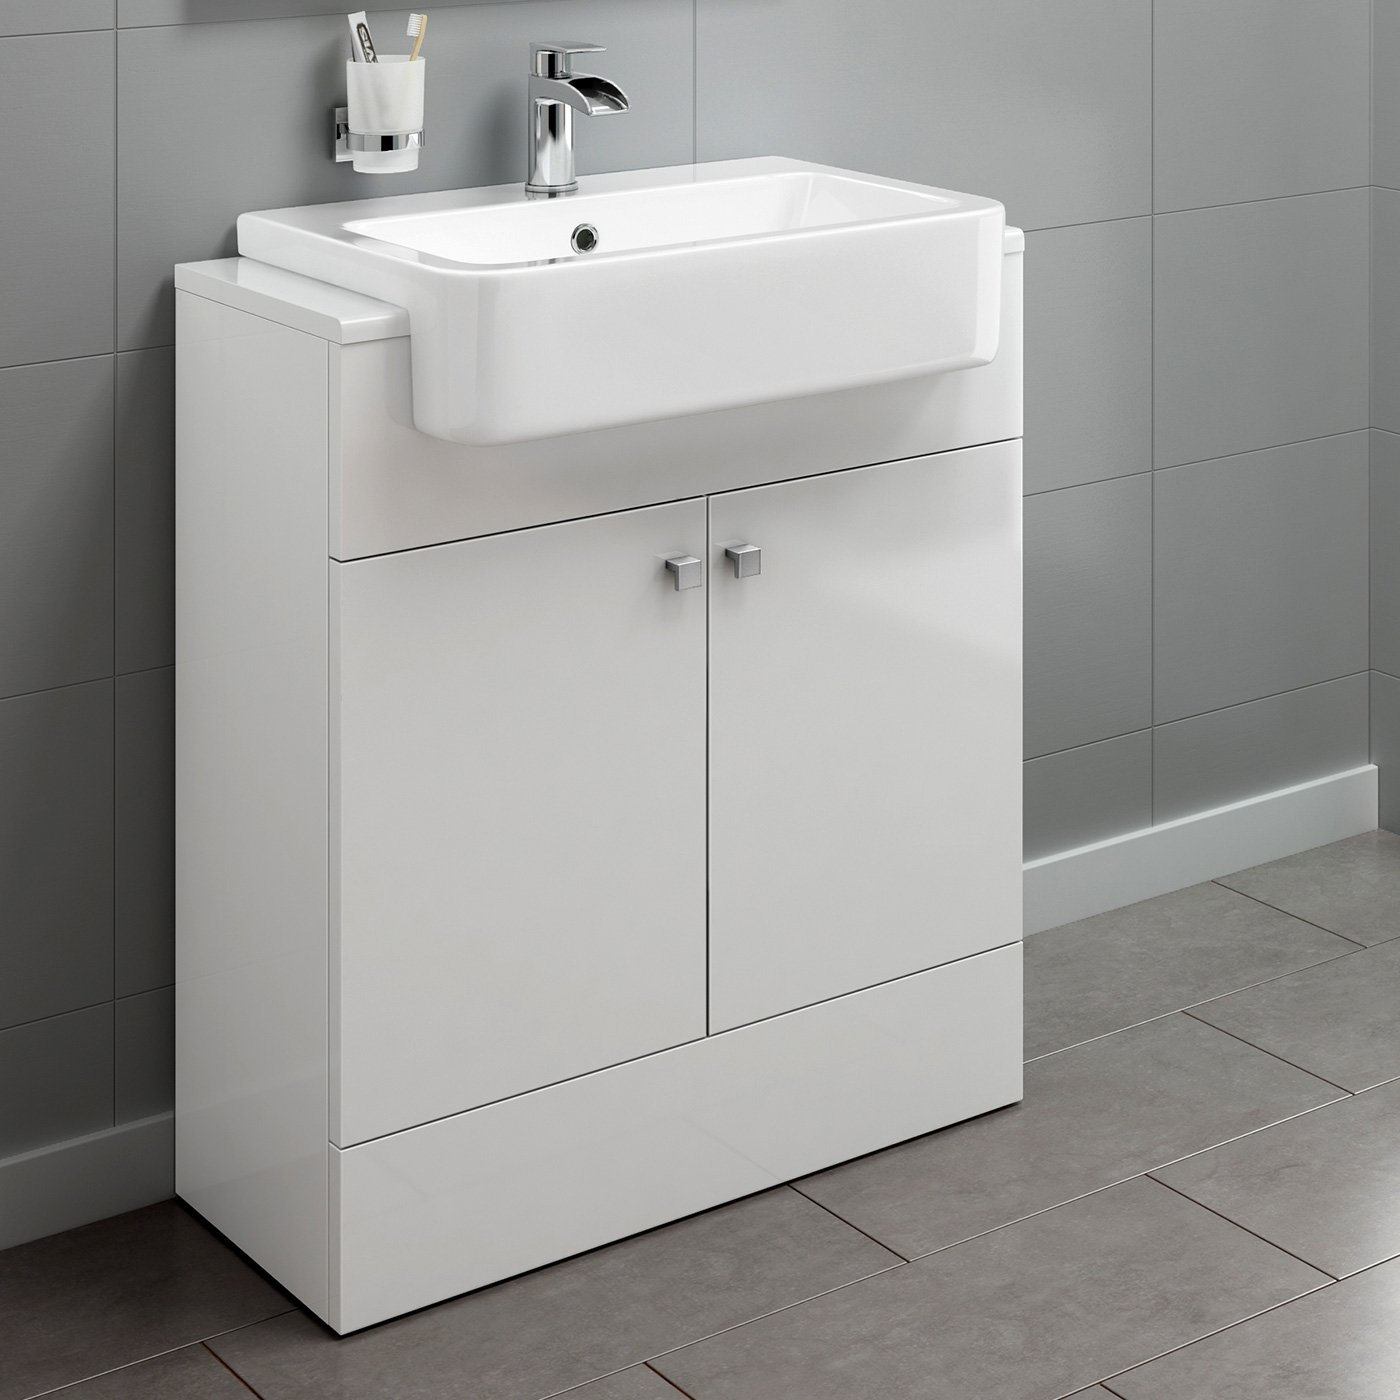 660mm Gloss White Basin Vanity Cabinet Bathroom Storage Furniture Deep Sink Unit iBathUK